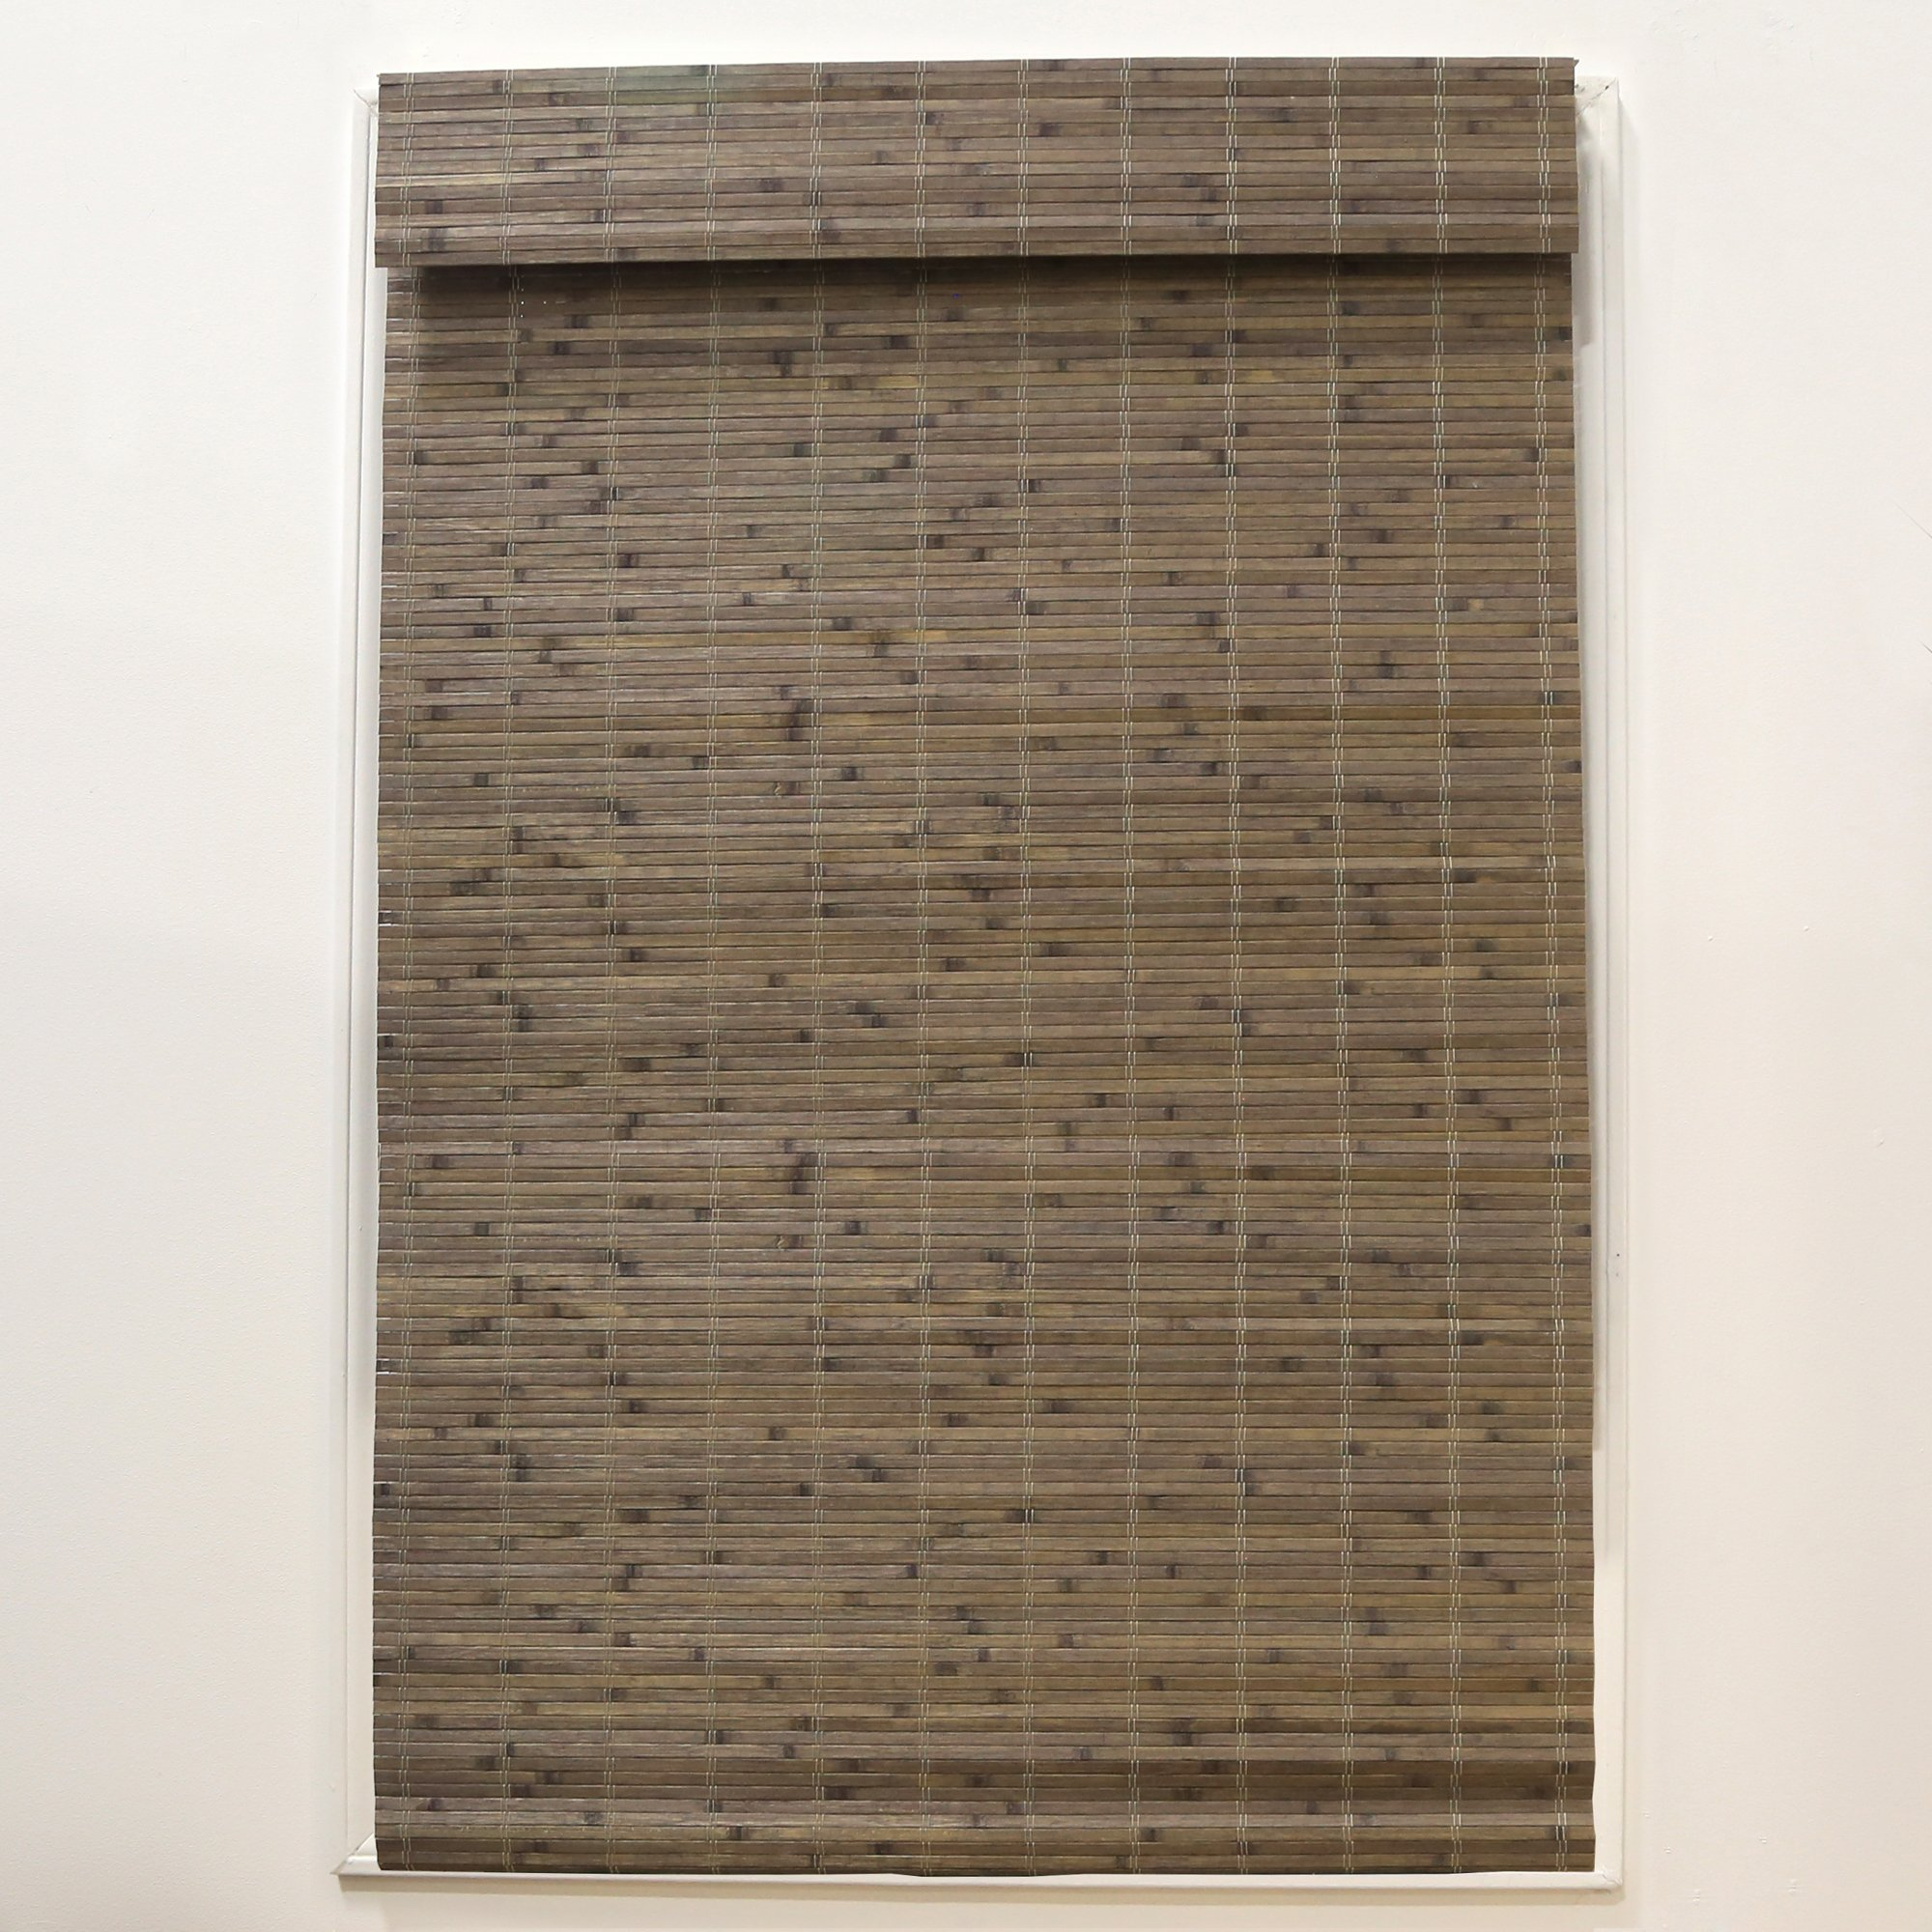 Radiance Cordless Driftwood Dockside Flatstick Bamboo Roman Shade by RADIANCE